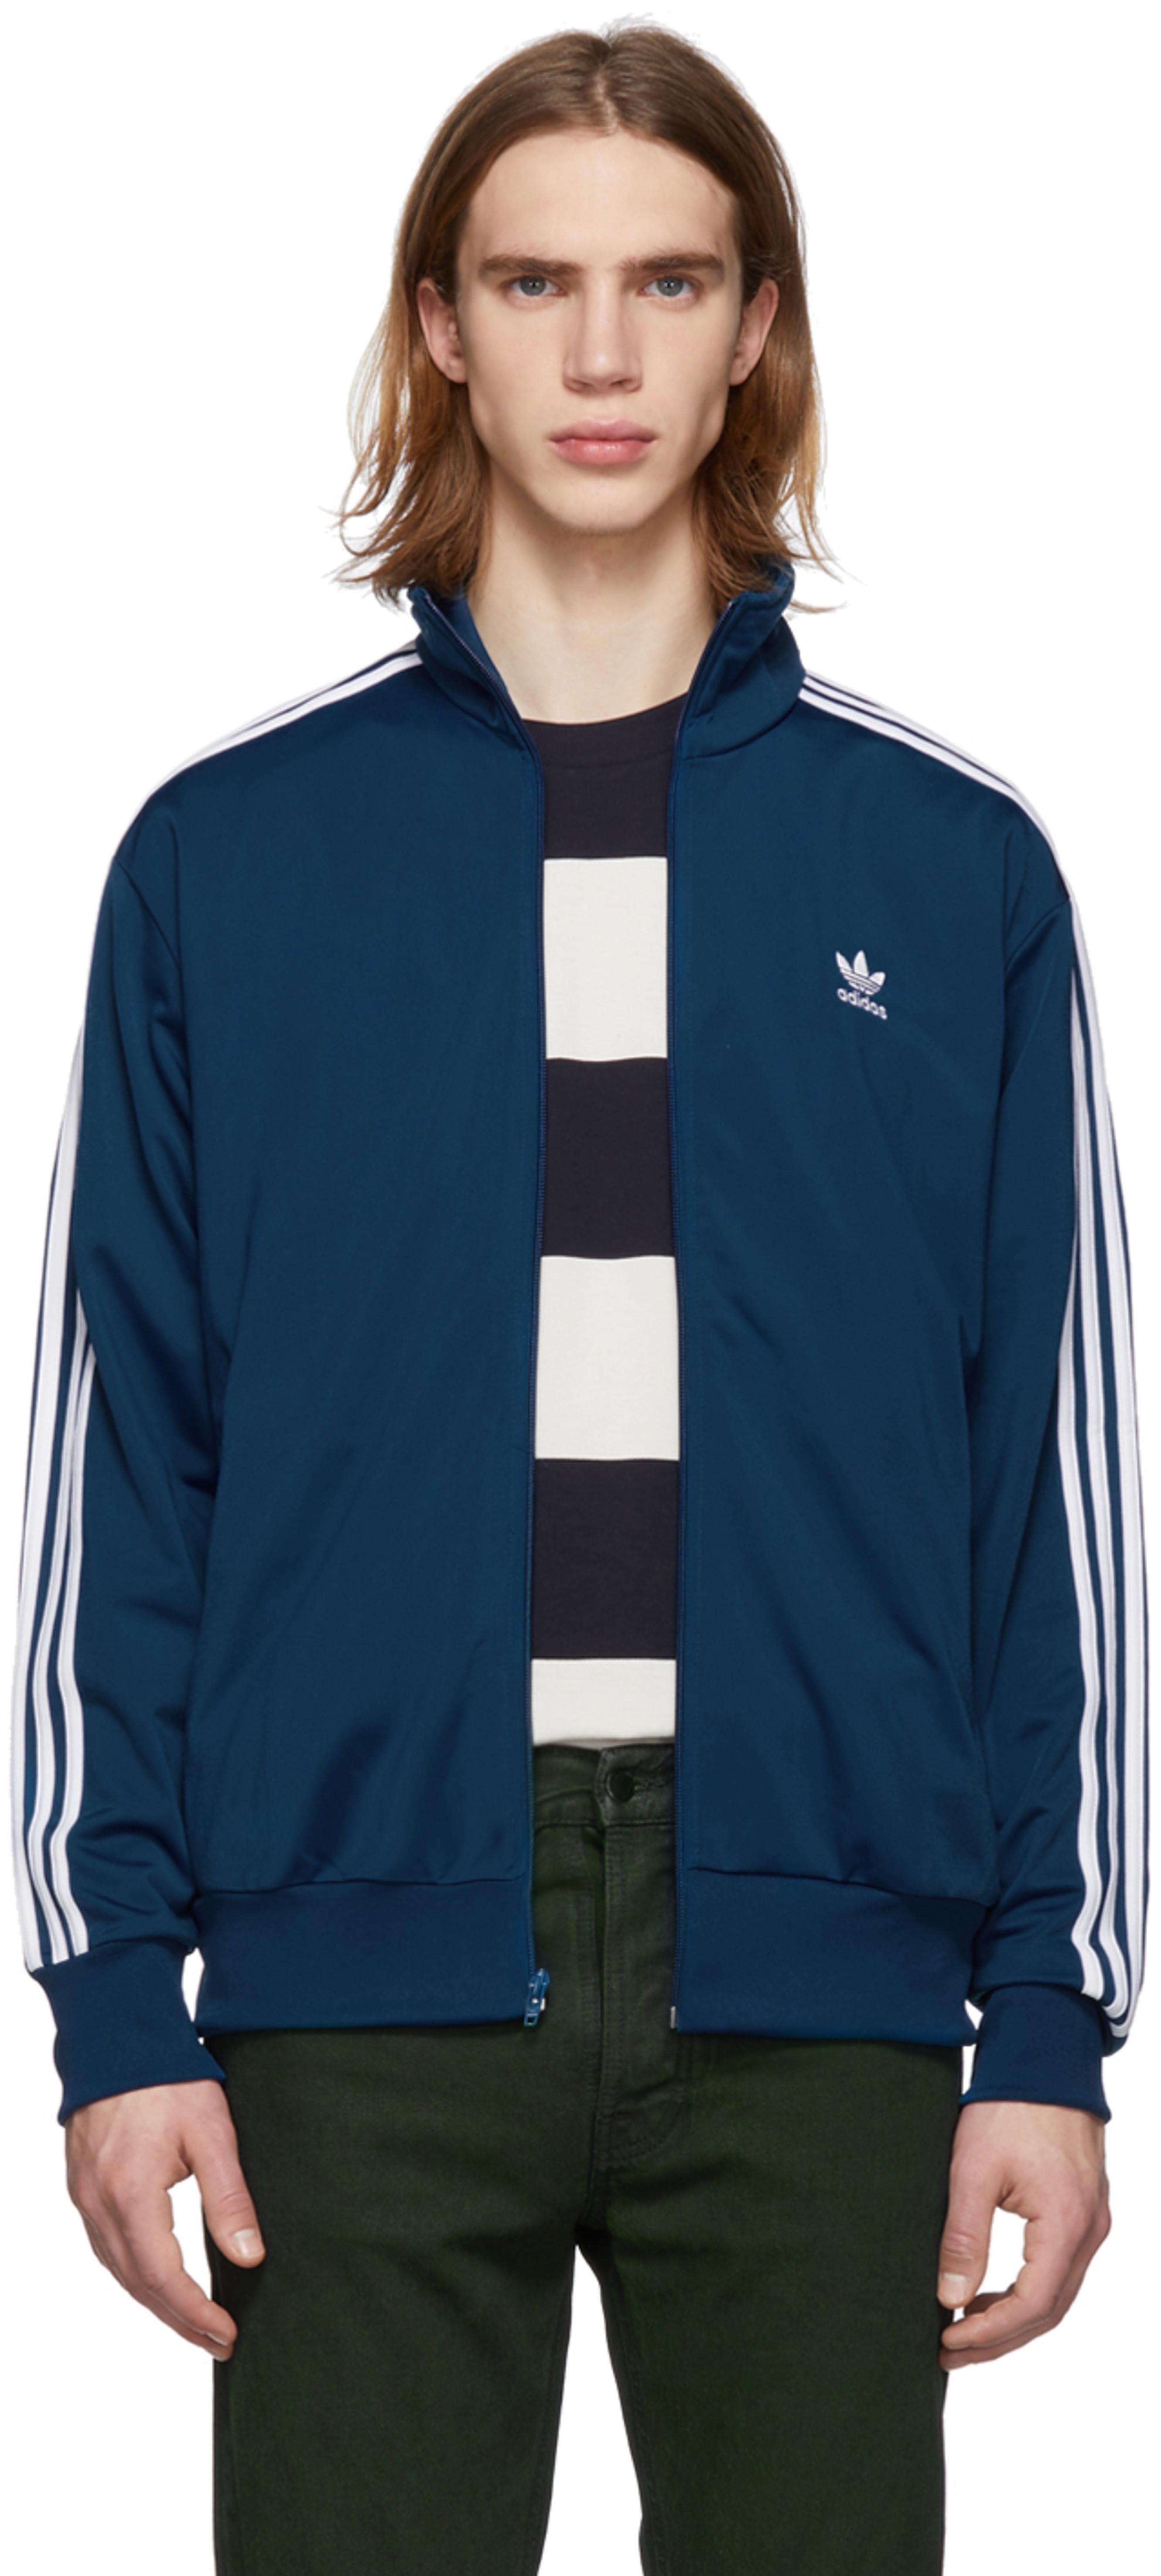 half off 04314 9b75d Adidas Originals for Men SS19 Collection  SSENSE